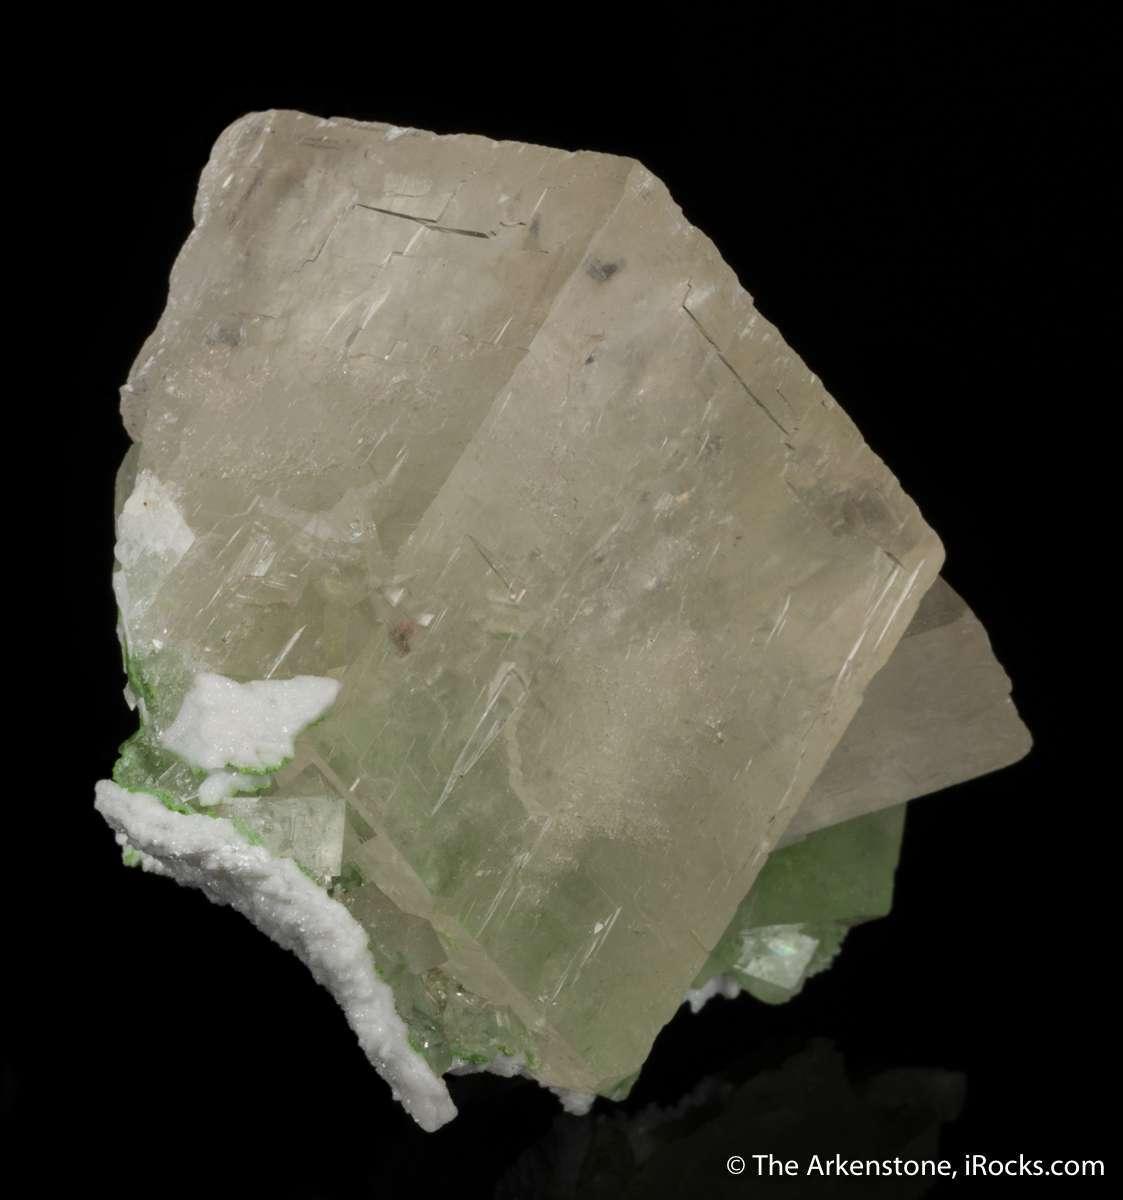 This unique Tsumeb calcite specimen collection purchased I visiting